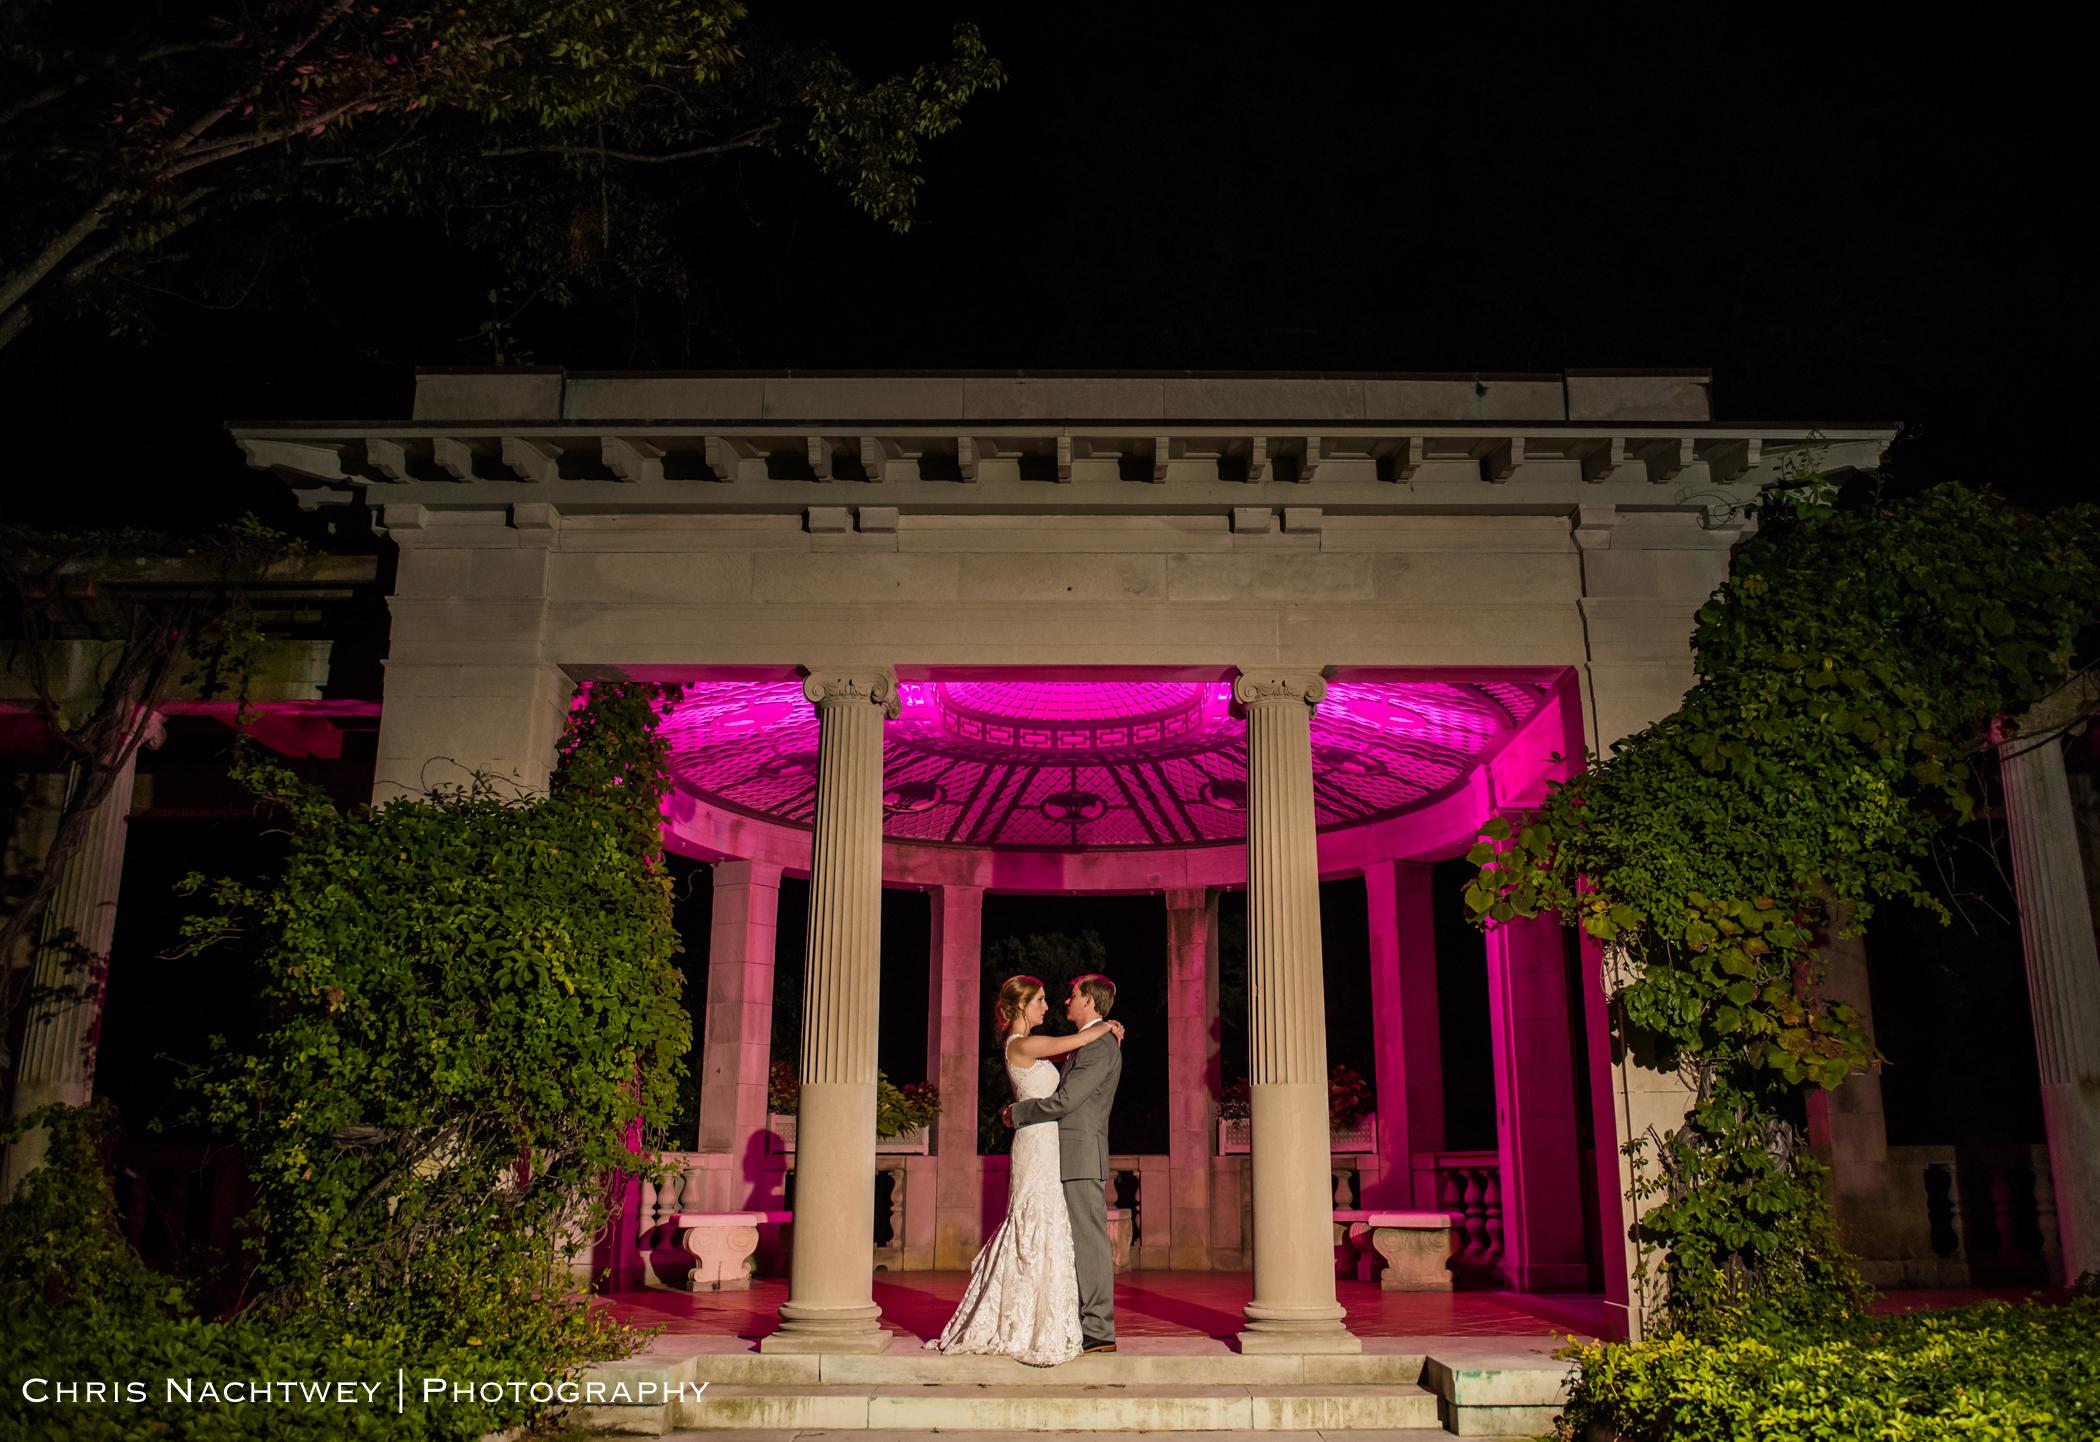 harkness-wedding-photos-chris-nachtwey-photography-2018-49.jpg